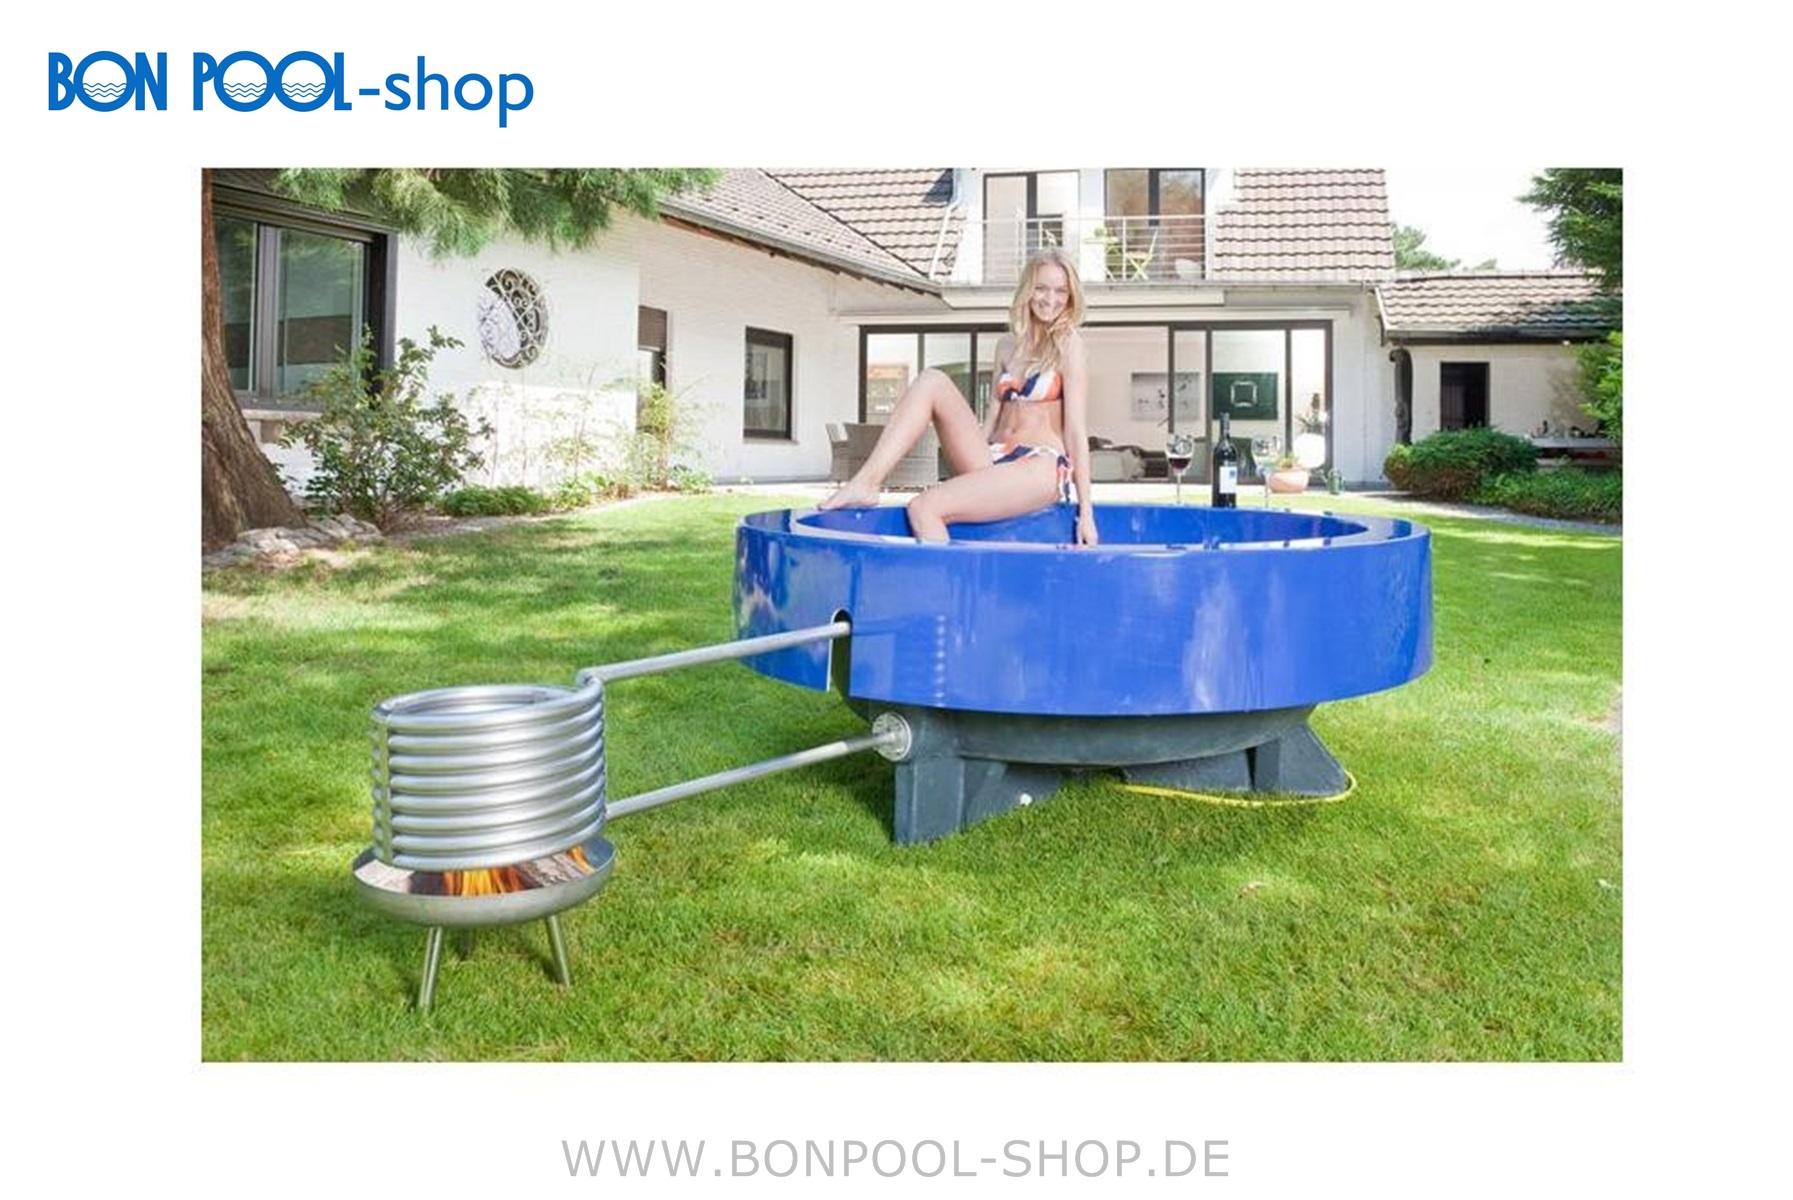 hot tub 2 0 blau outdoor pool bon pool. Black Bedroom Furniture Sets. Home Design Ideas